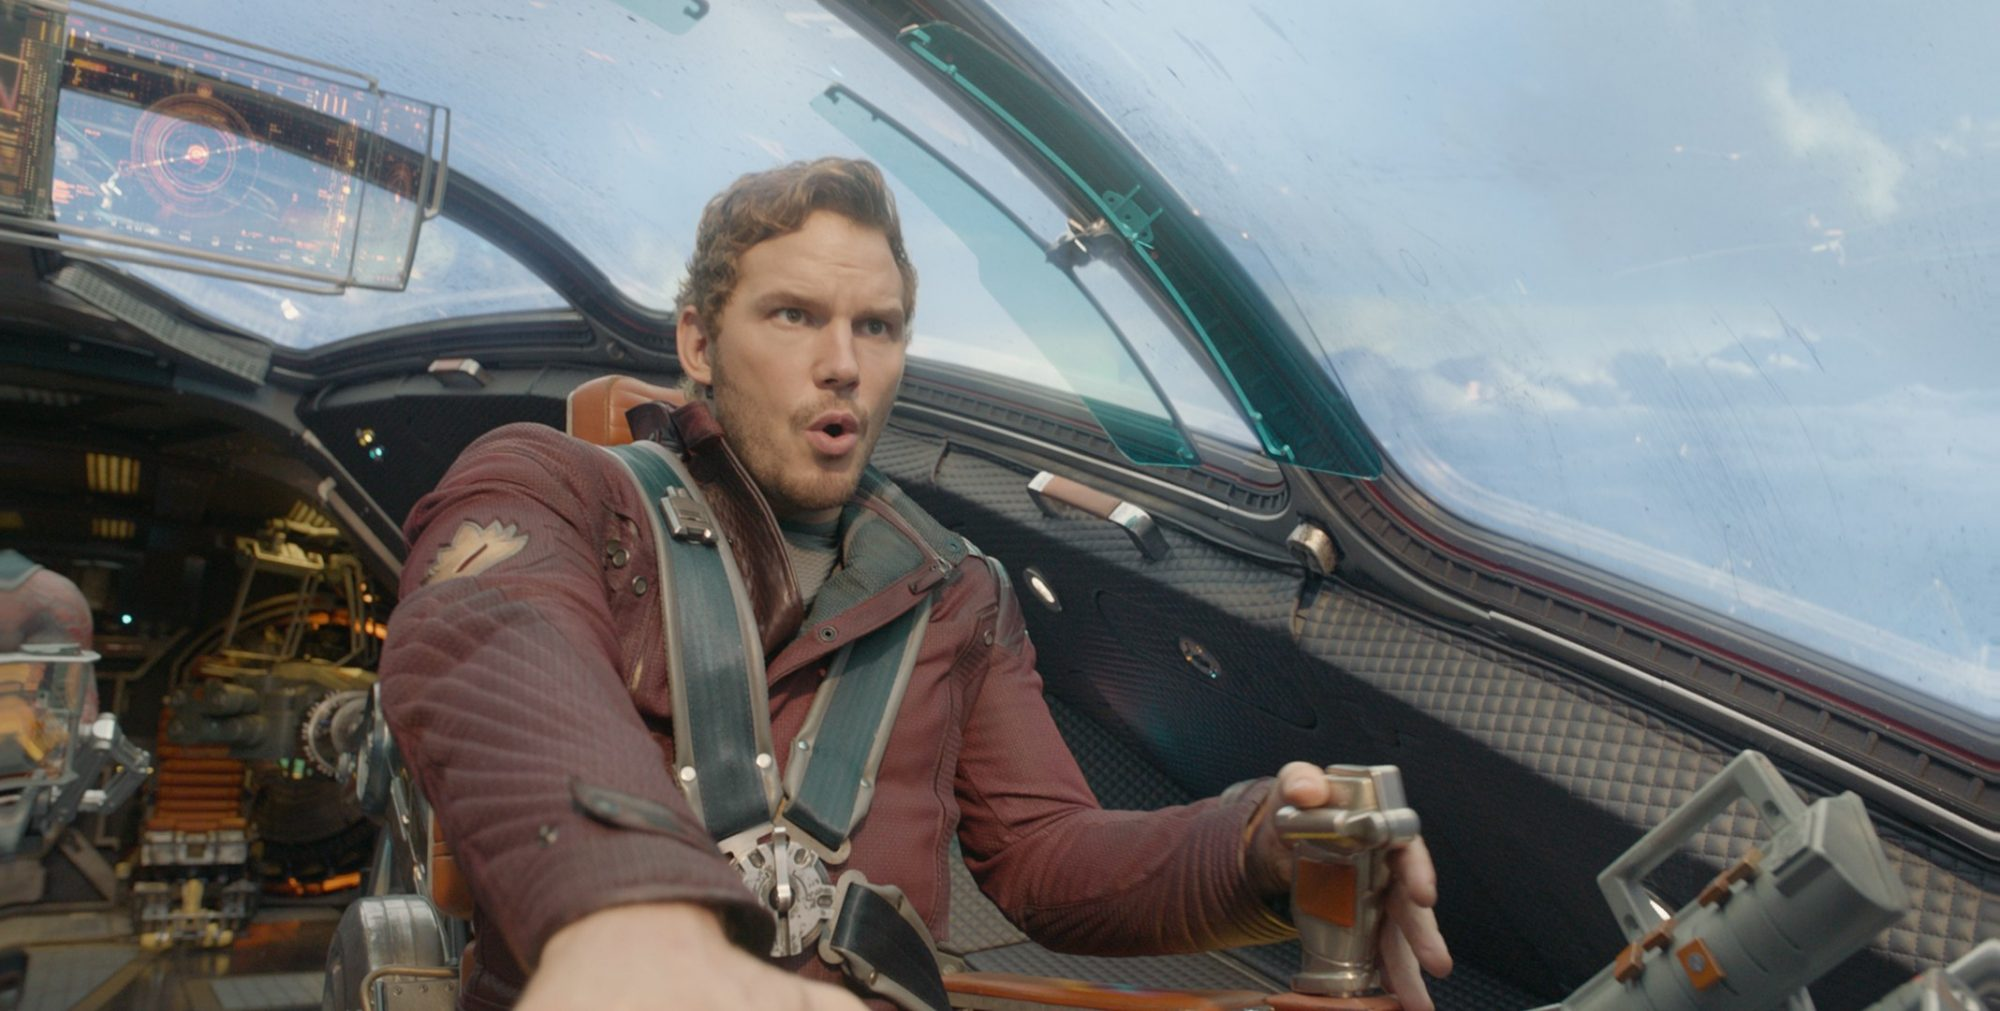 Chris-Pratt-in-Guardians-of-the-Galaxy